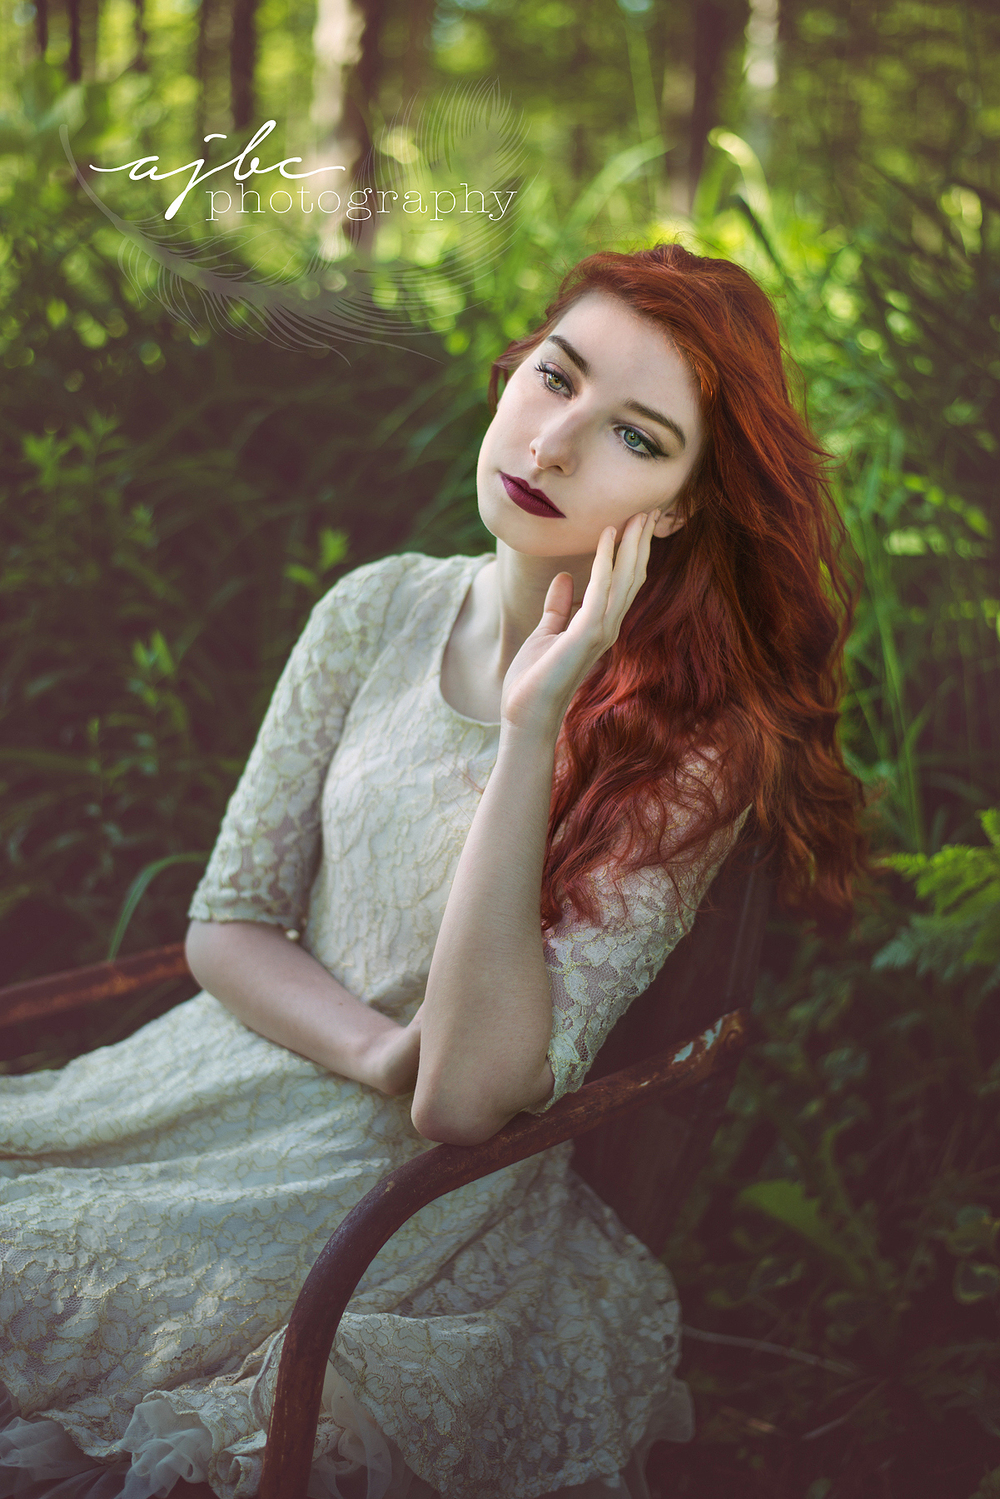 AJBC Photography Fine Art Port Huron Beauty Photographer red hair.jpg